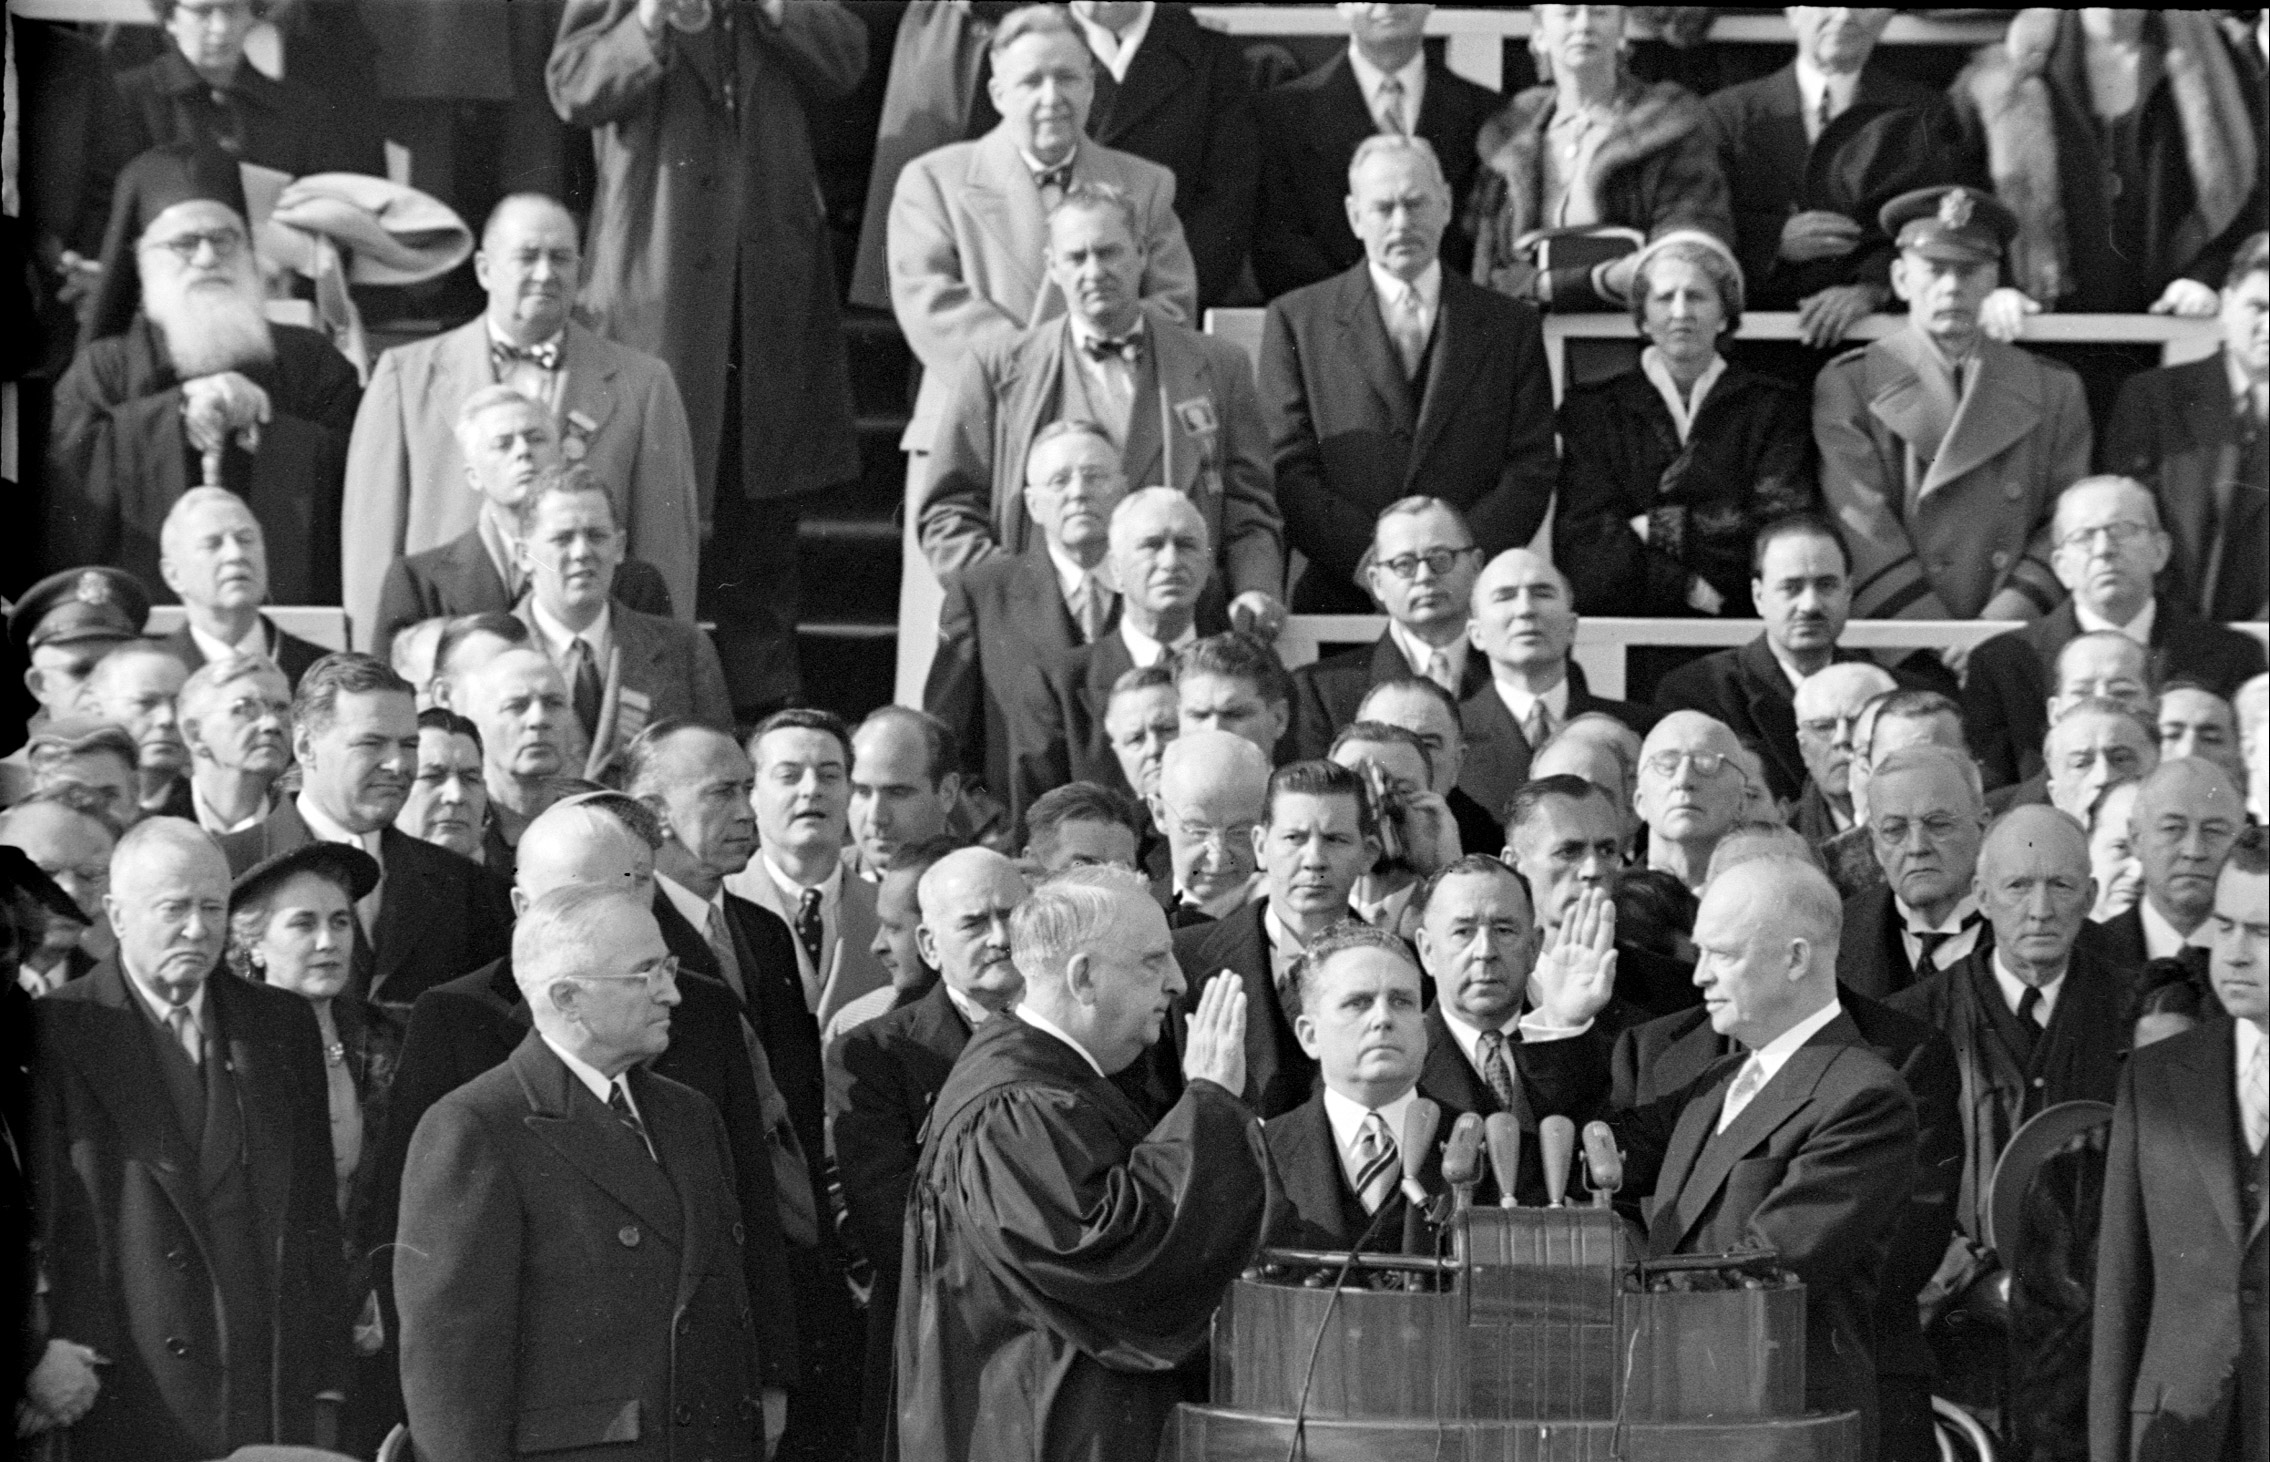 Eisenhower Inaugural, 1953.